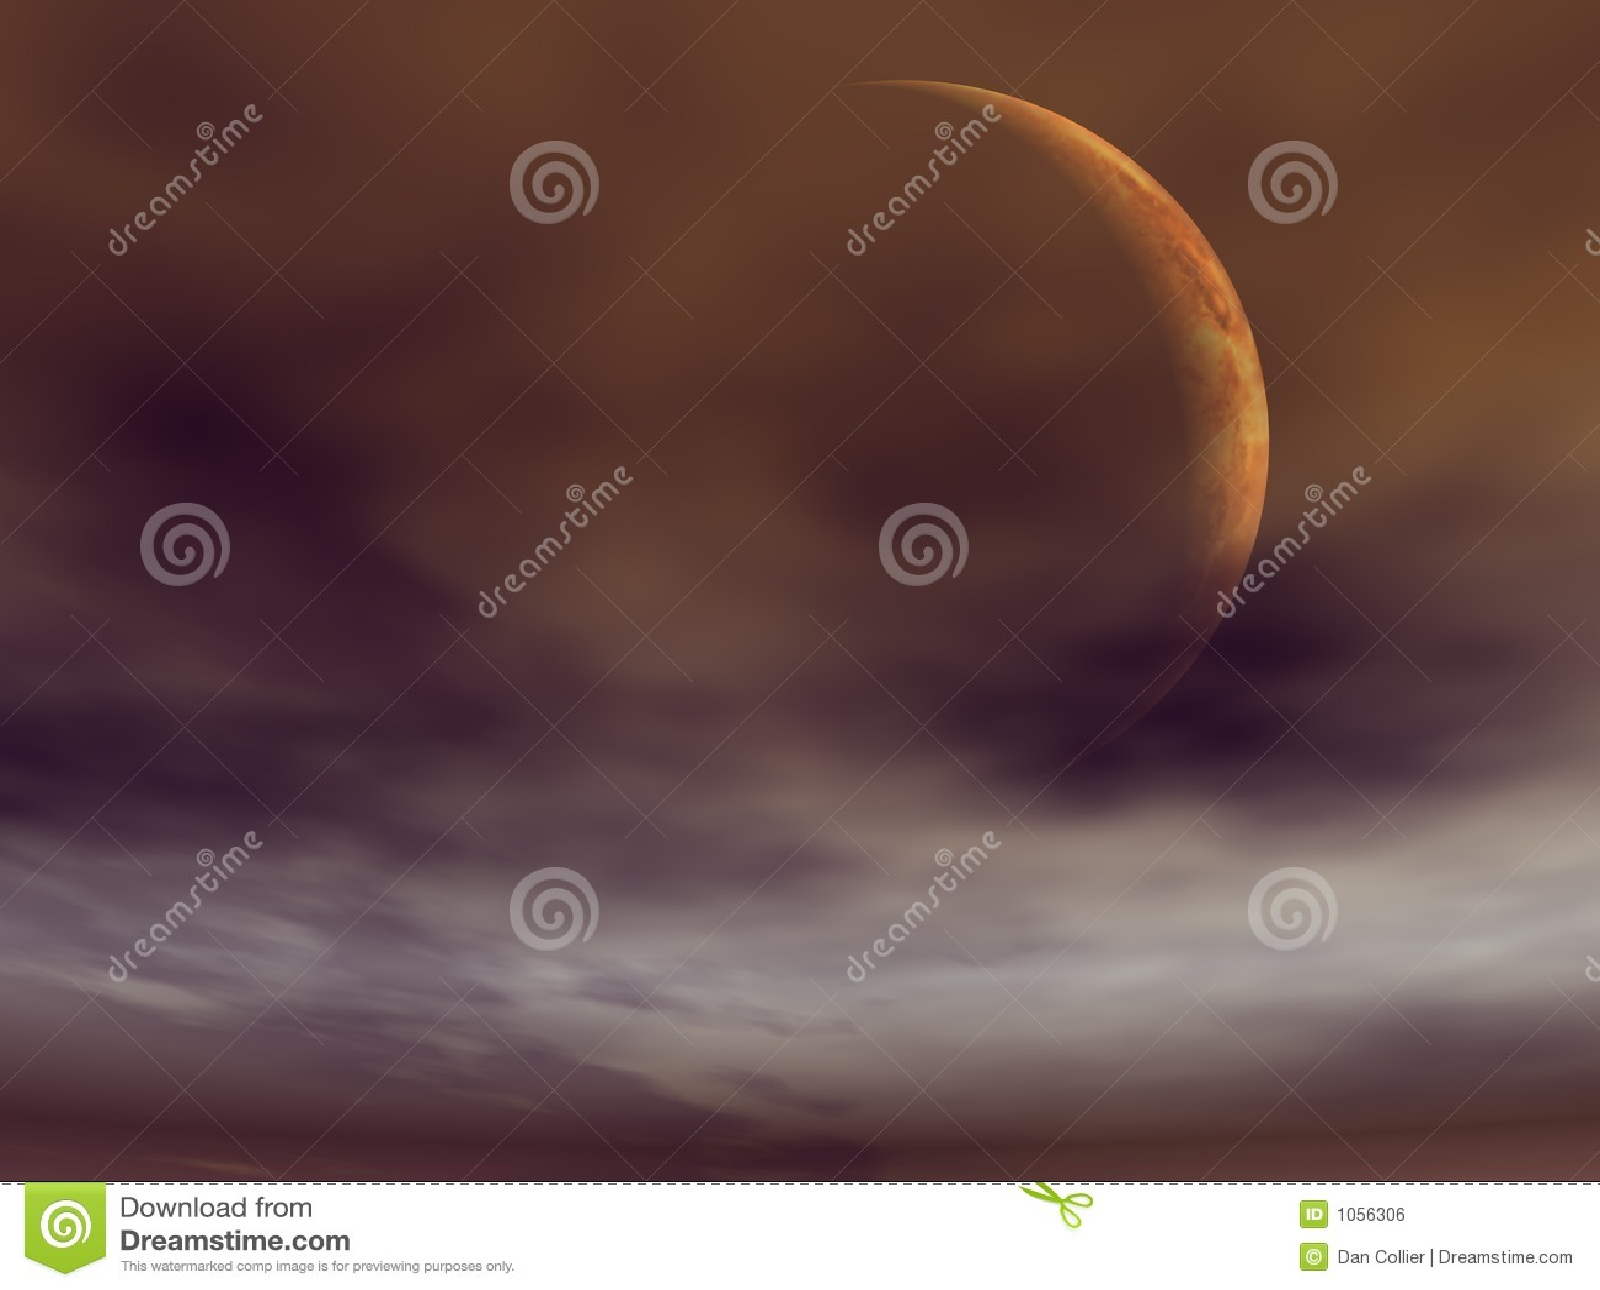 venus and its moons - photo #44